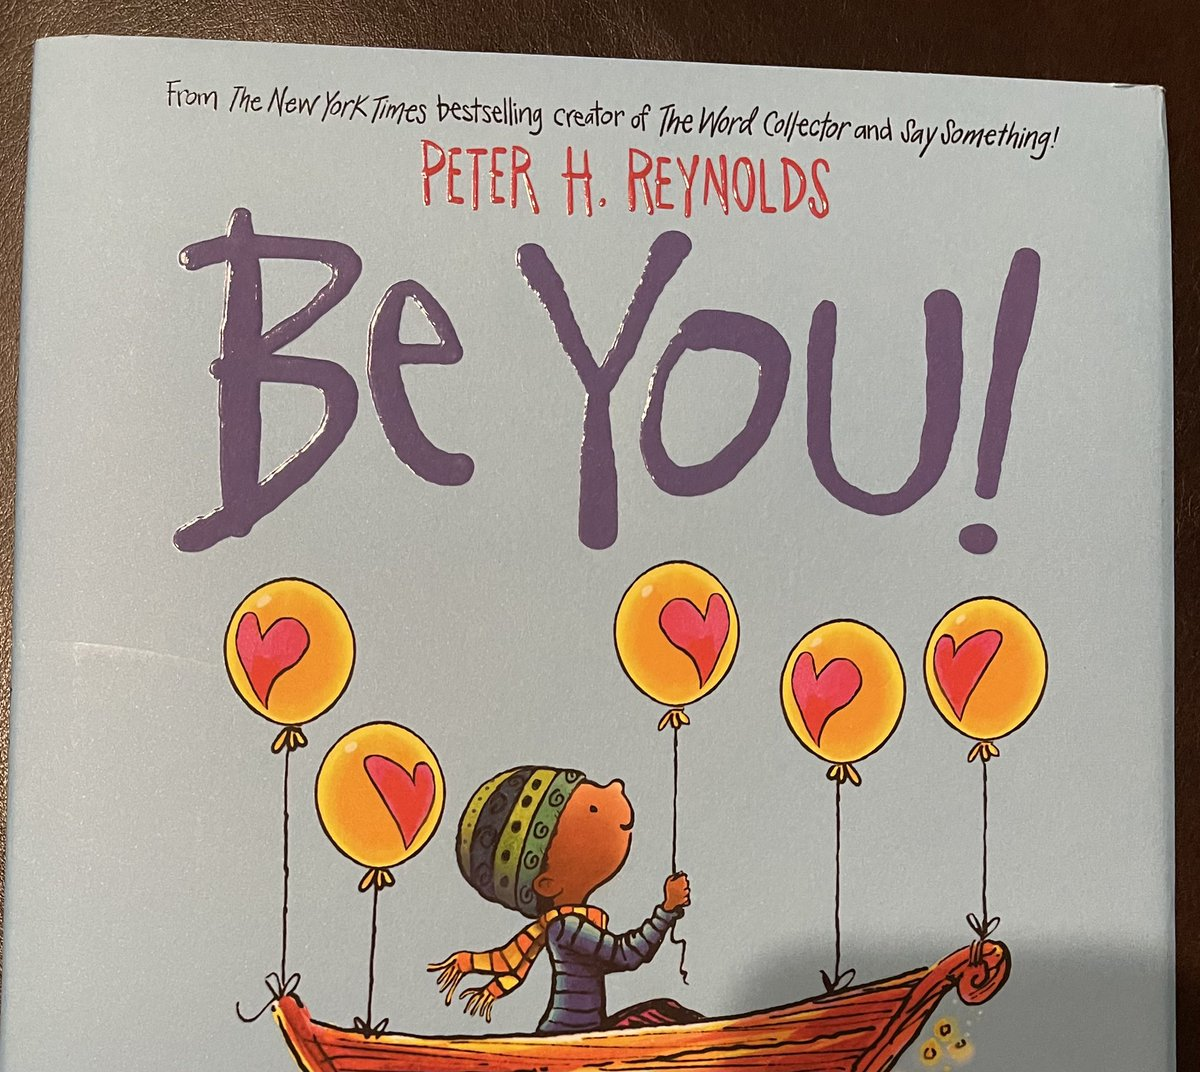 Off 2 read to my kindergartners. Today's book is 'Be You' by @peterhreynolds (a favorite of ours.)  #ReadToAChildToday #WordsMatter #BeYou @CajunBlueAZ1 @ShelbyKStewart @MaddyVBH2020 @dianemariereid @BingBongBingBi1 @KenobiCheated  @phyllisj1003 @Tmcguire_pa